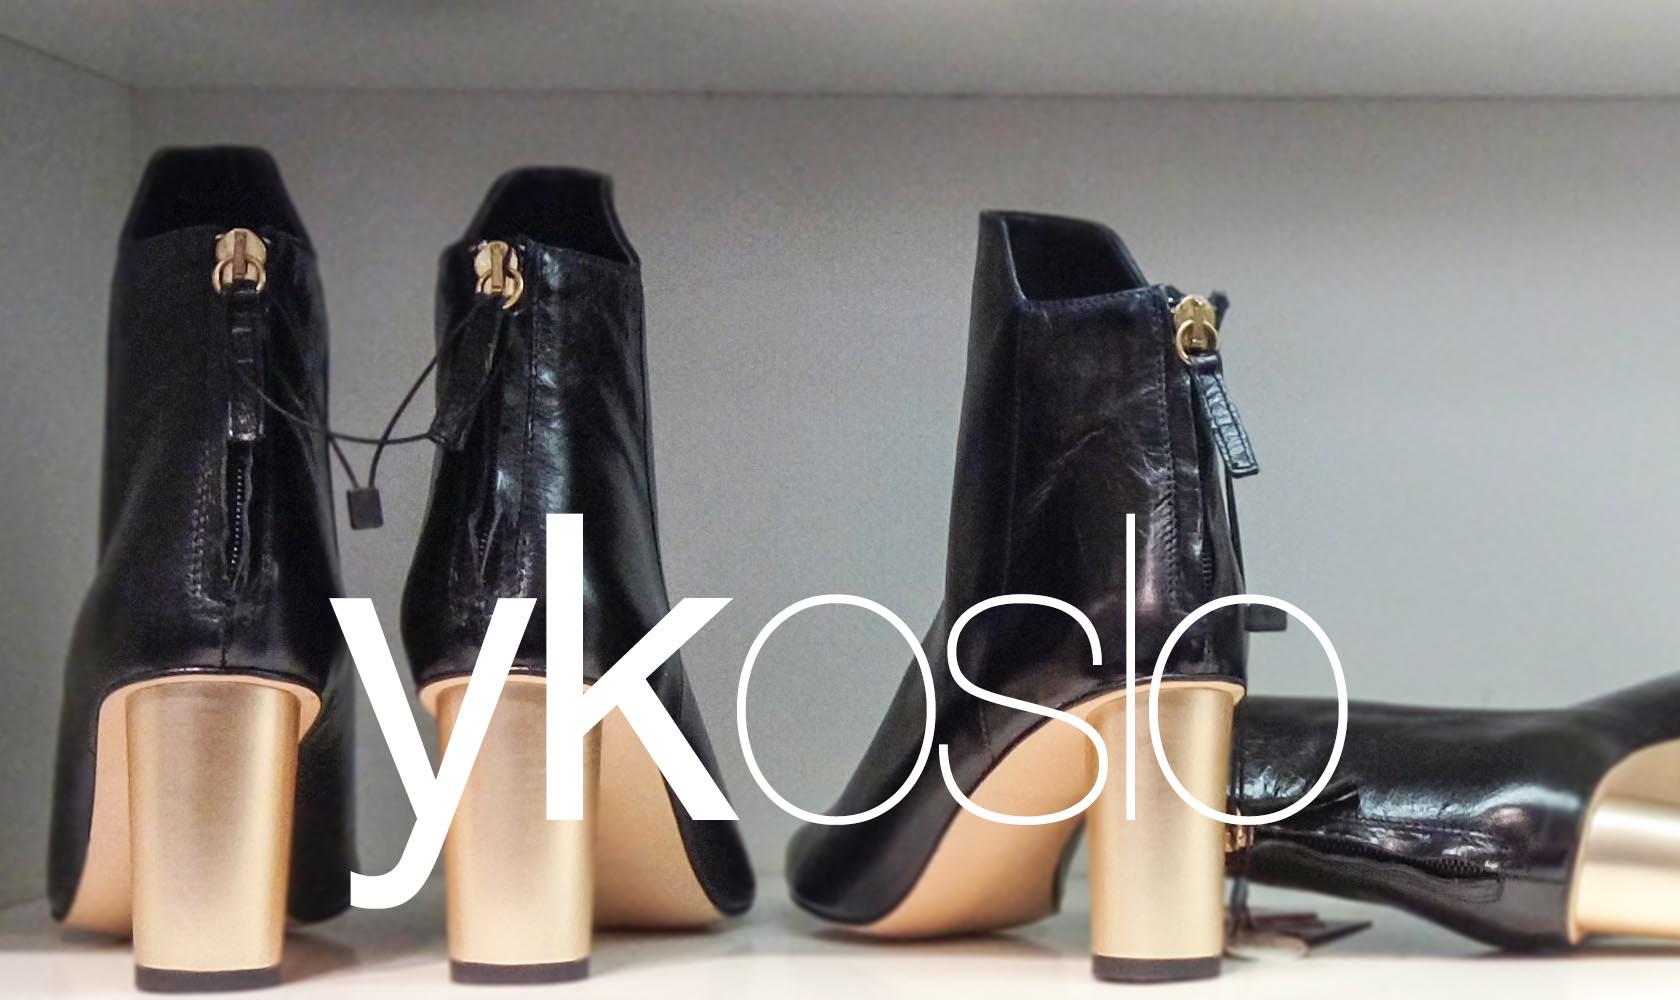 ykoslo__3